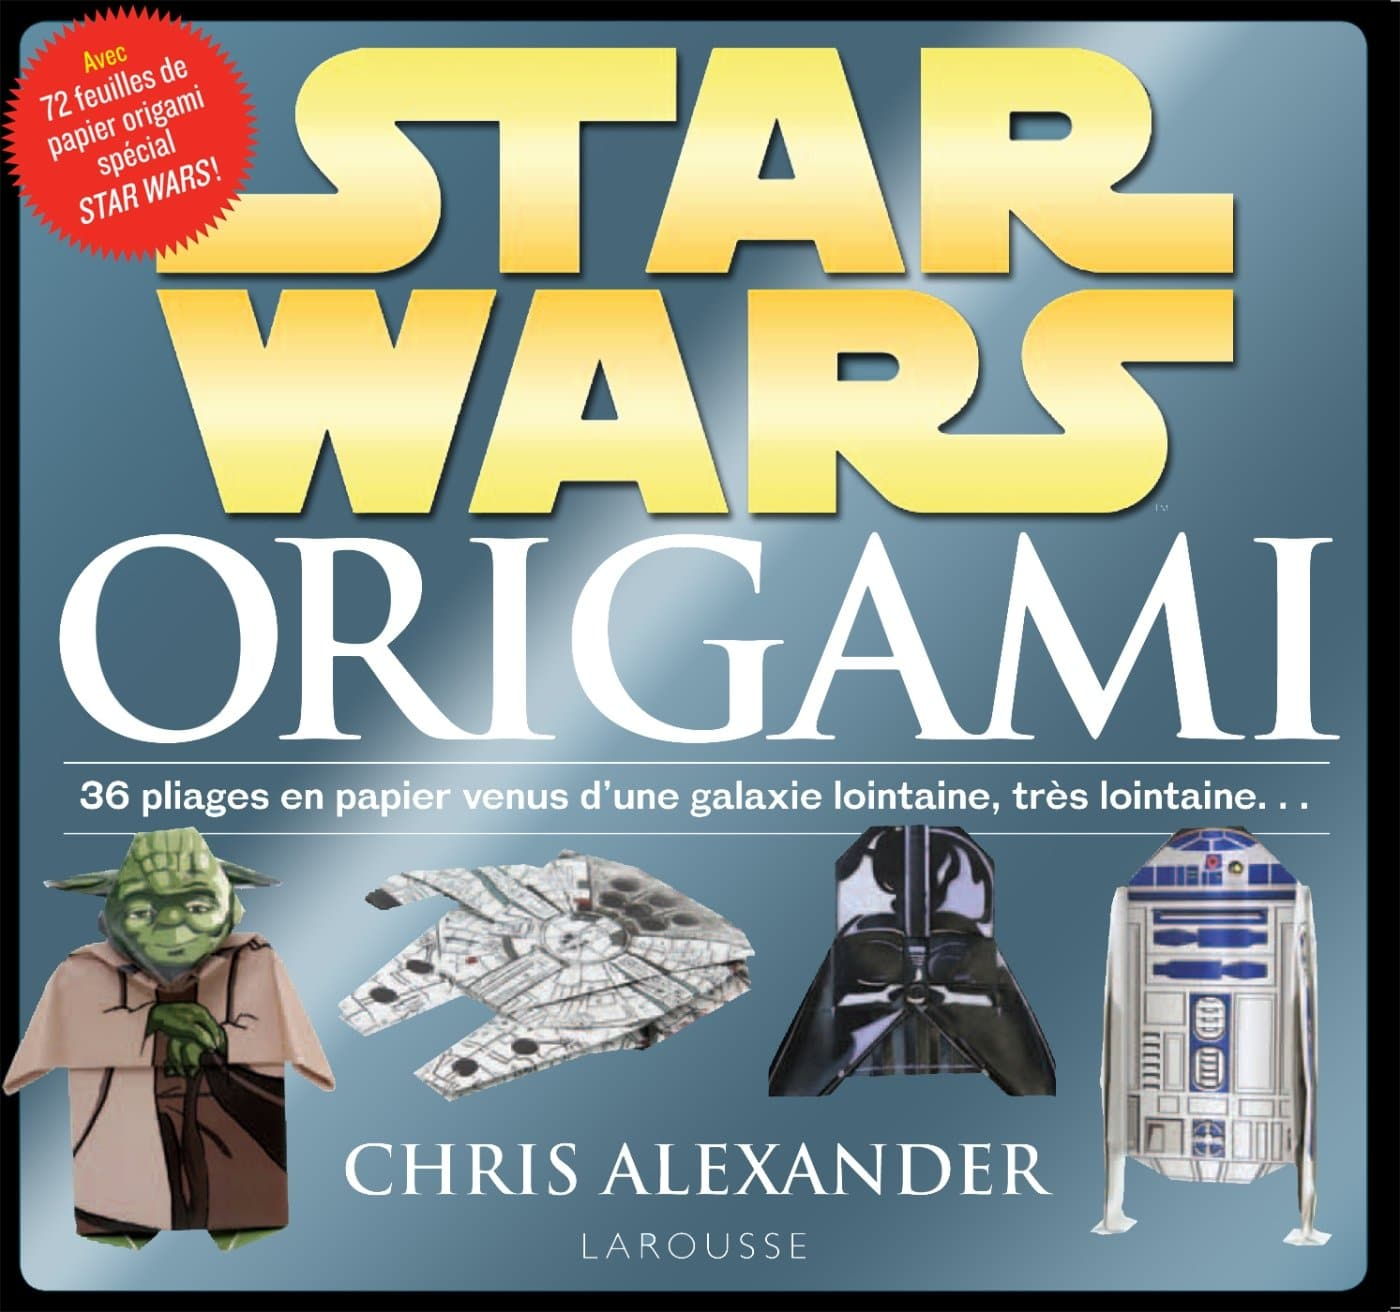 Star Wars Origami livre geek original